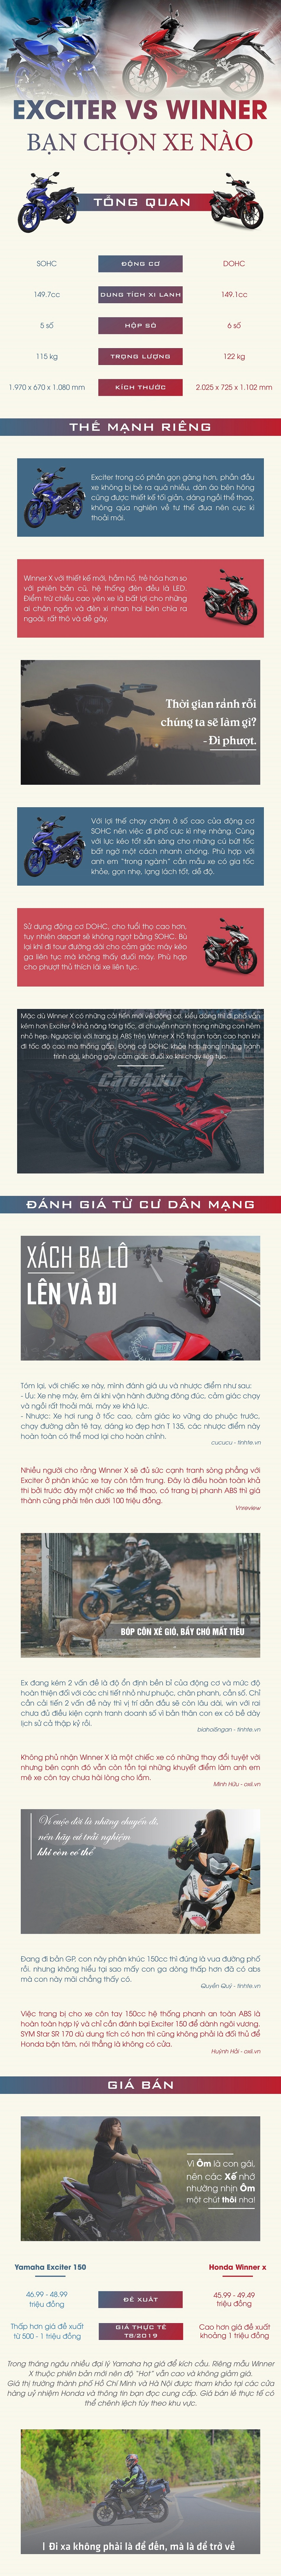 exciter-vs-winner-ban-chon-xe-nao